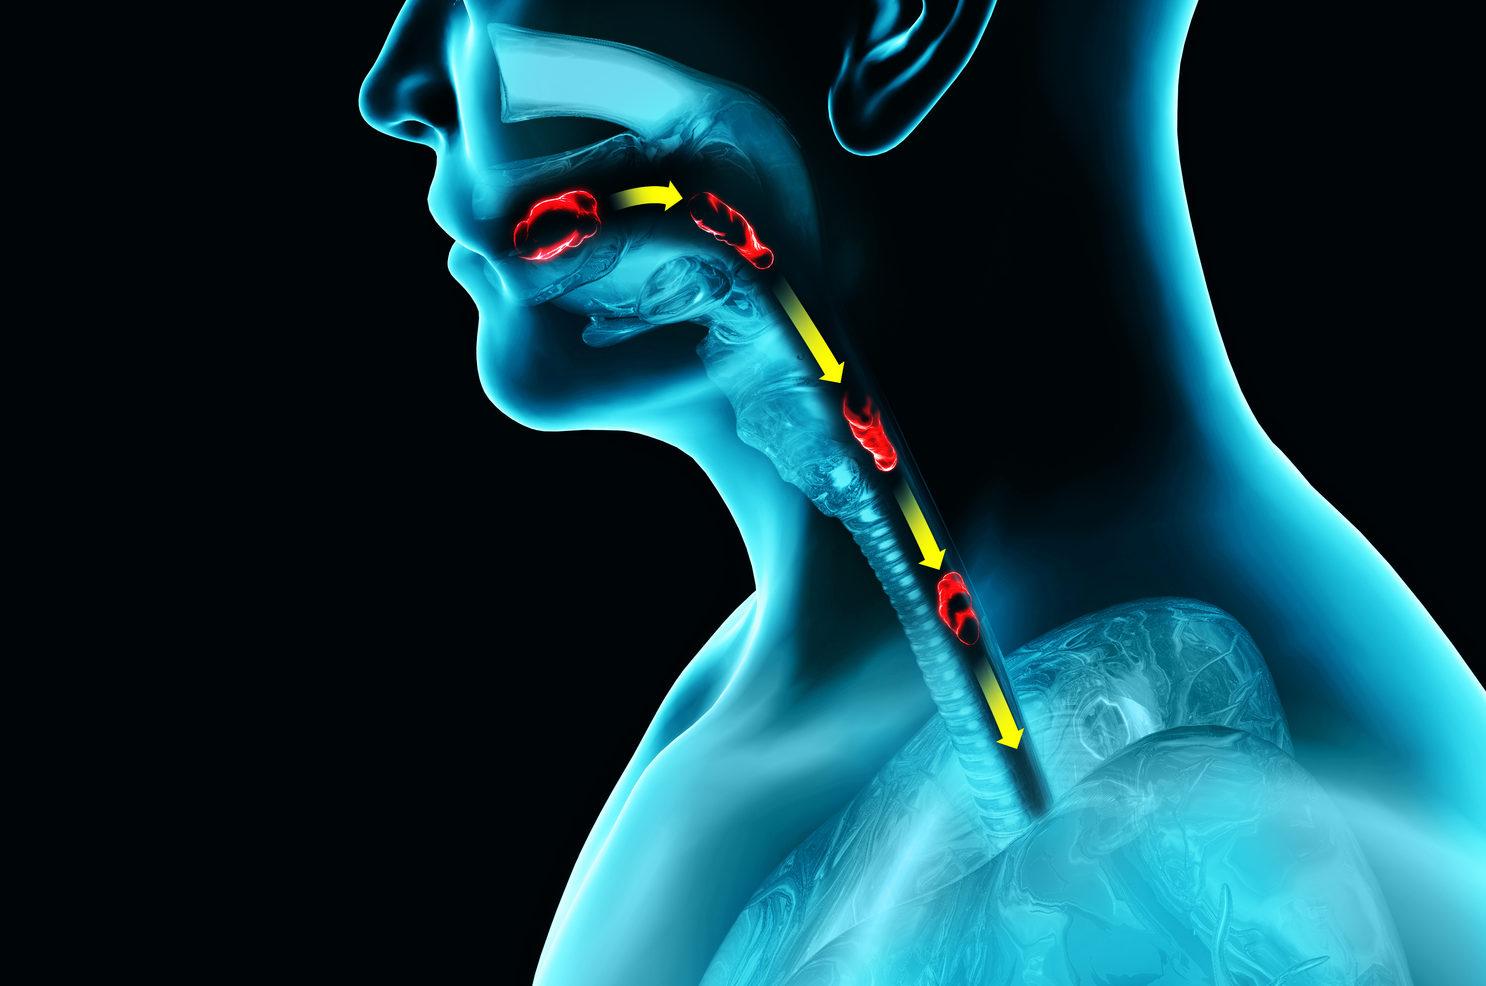 Swallowing diagram